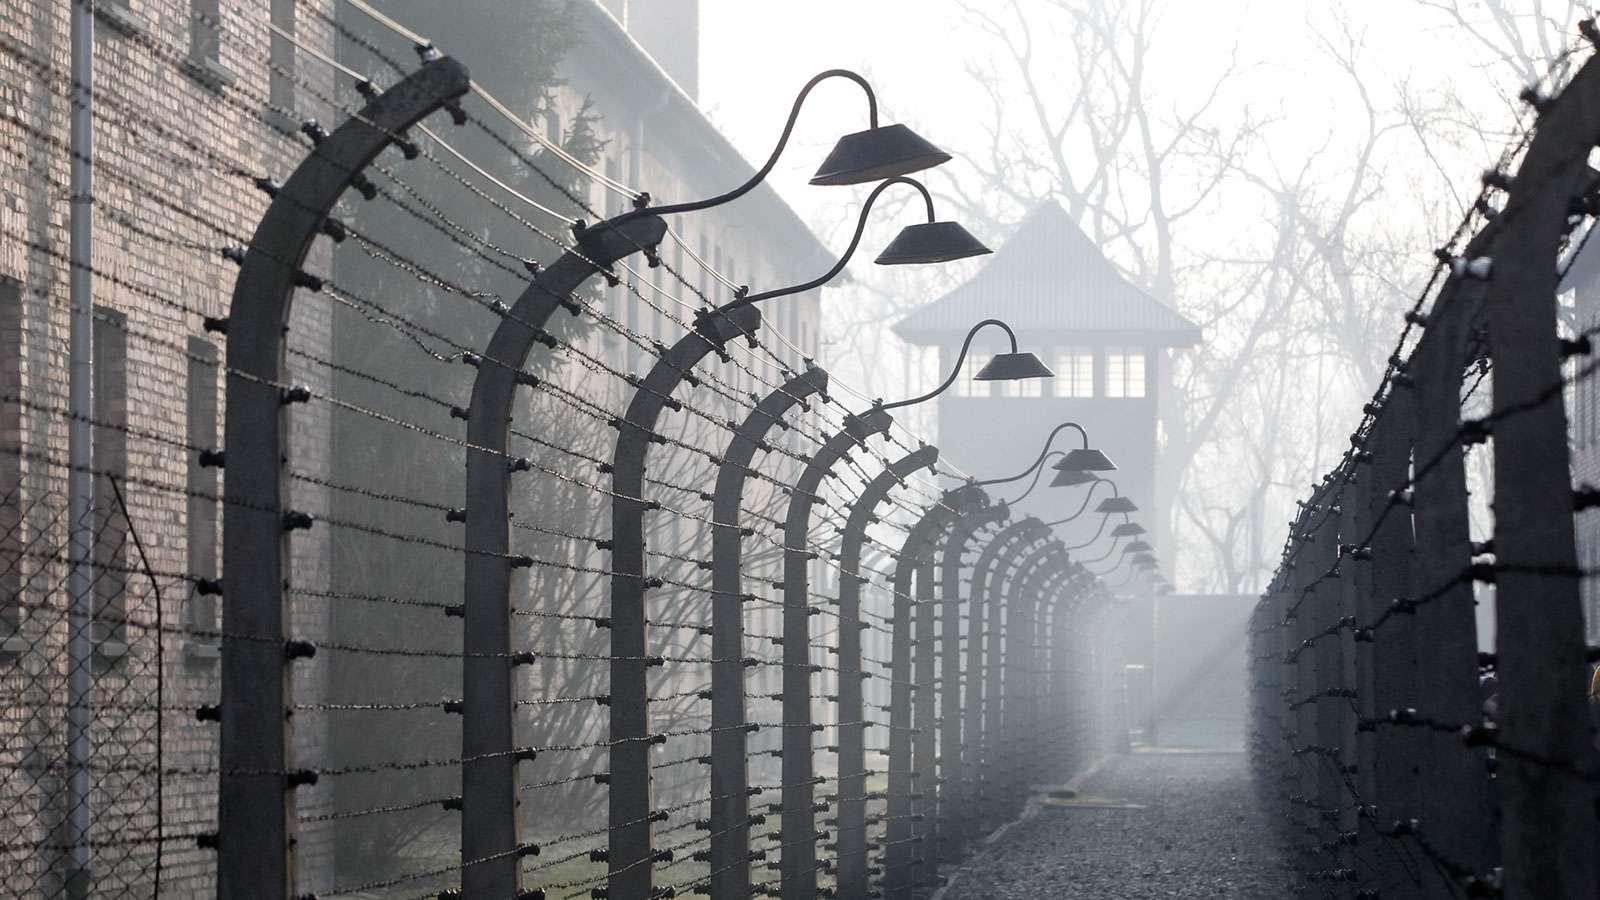 Auschwitz Απελευθέρωση Κόκκινος Στρατός 75 χρόνια